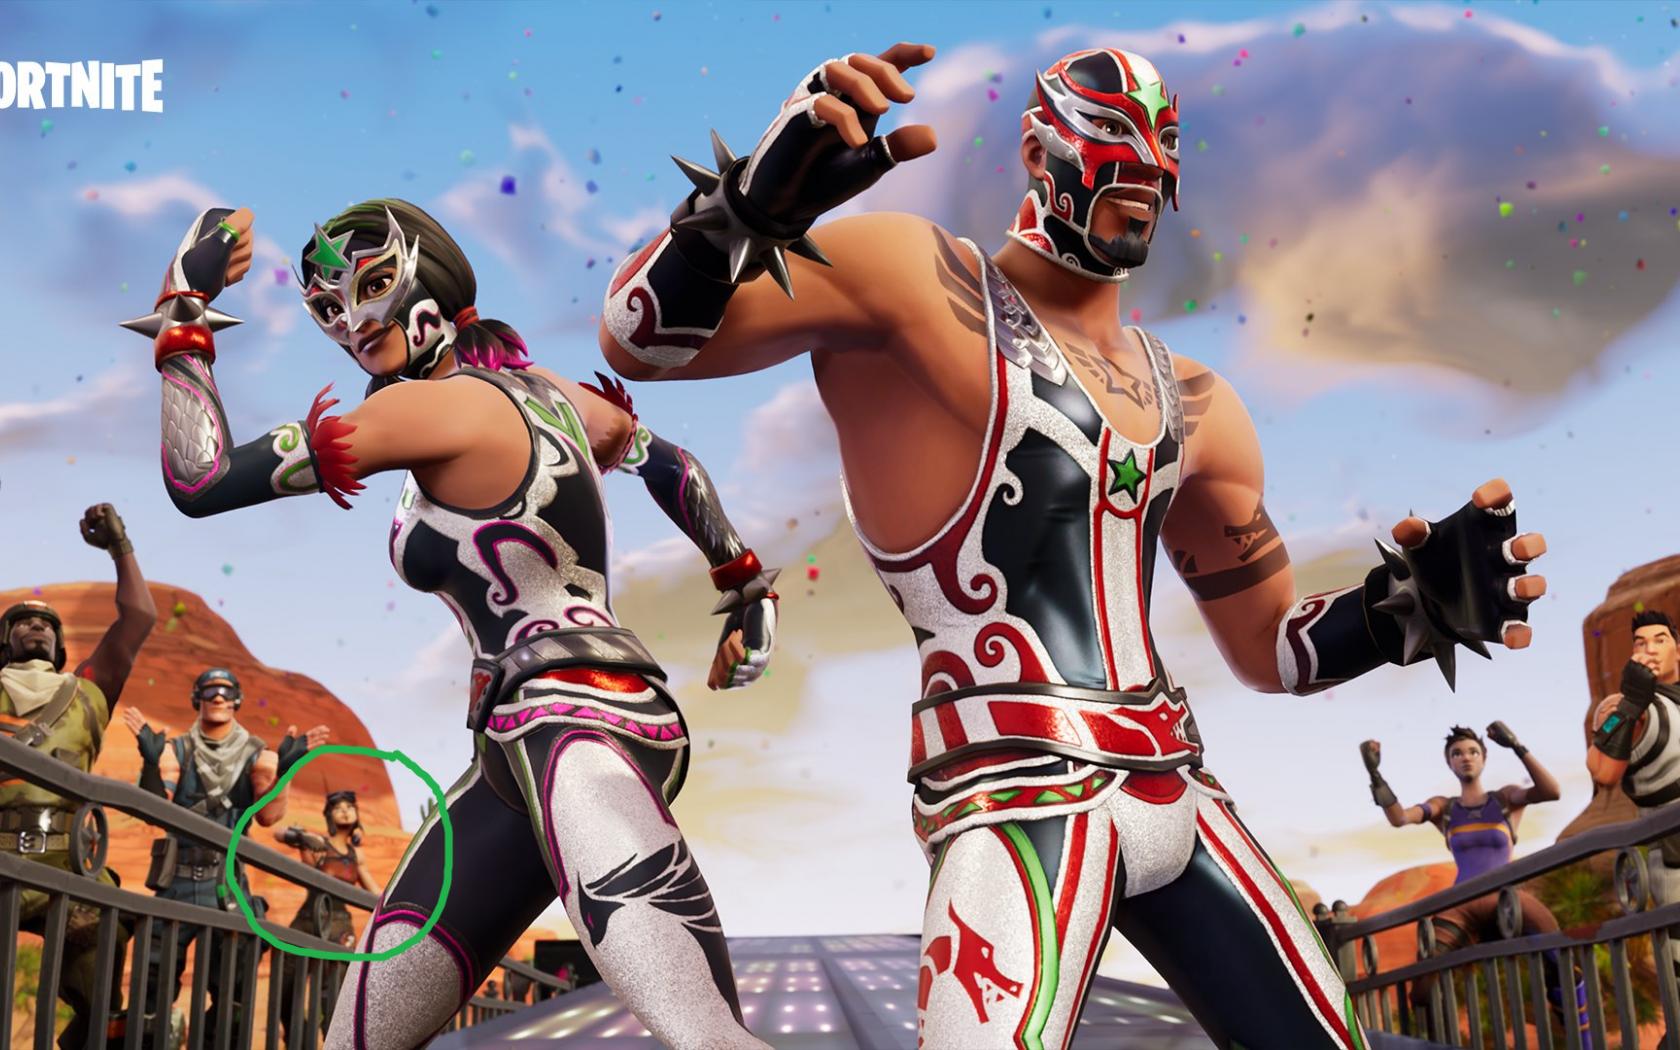 Free Download Renegade Raider Confirmed Fortnitebr